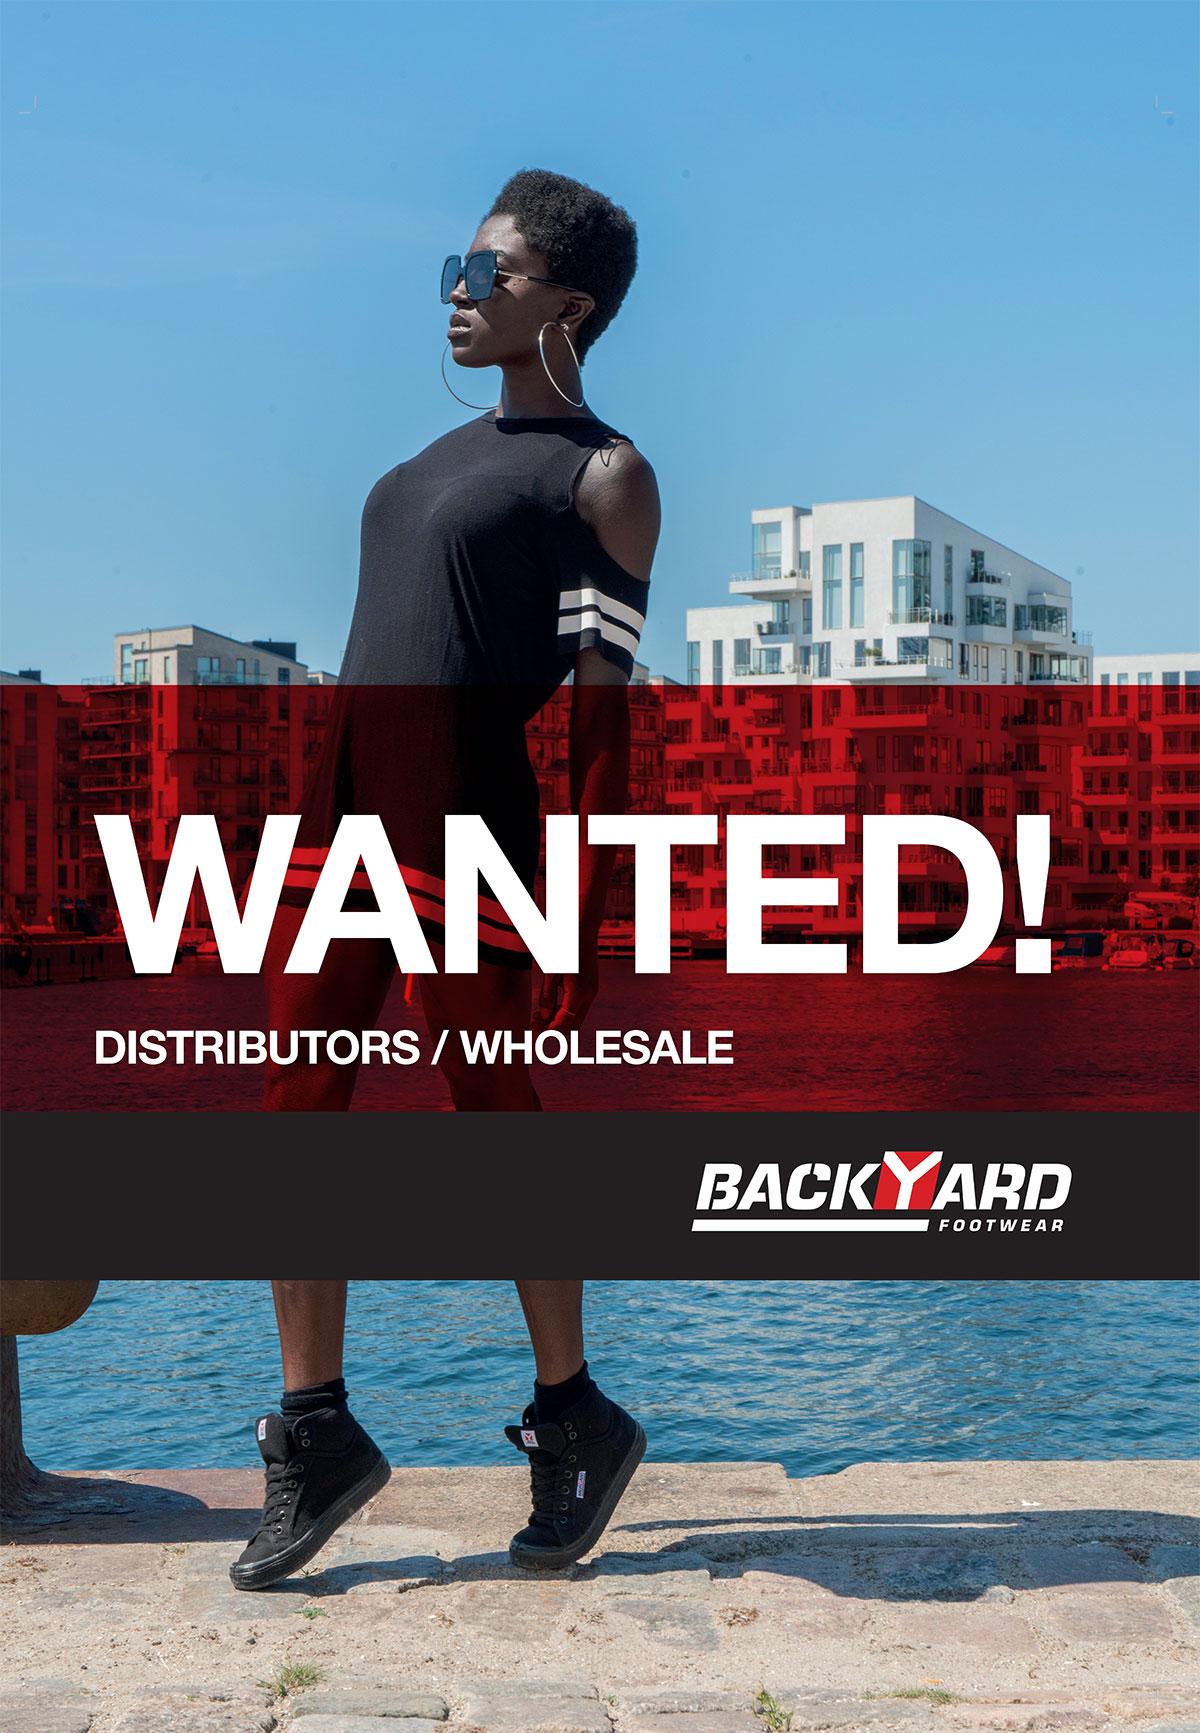 Wanted: Distributors/Wholesale